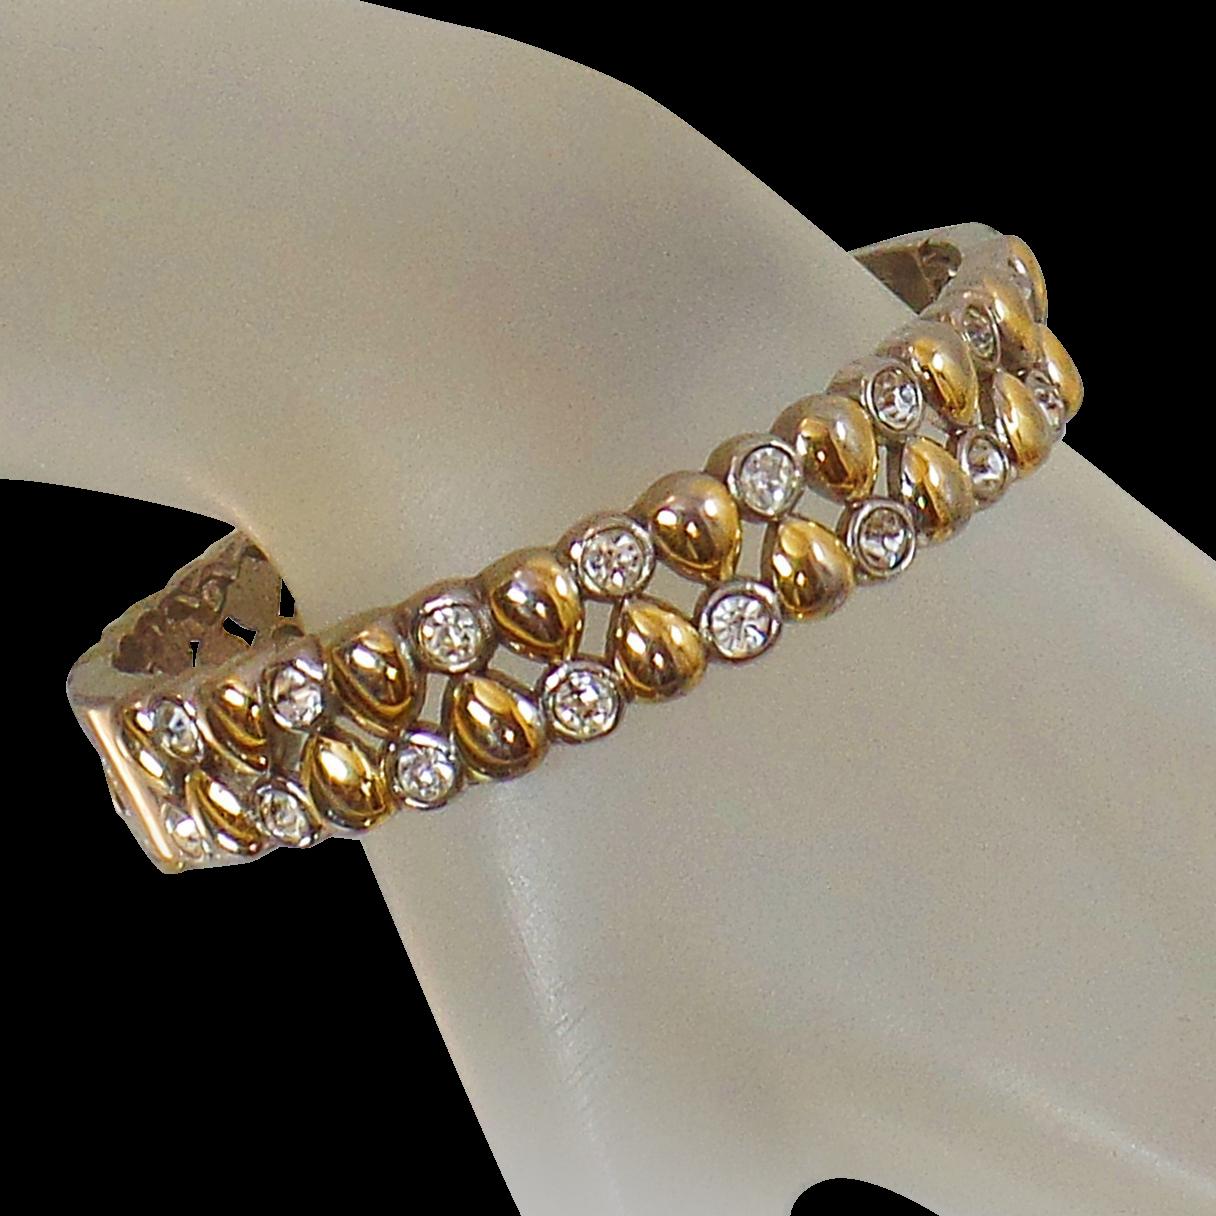 Vintage Silver Gold Rhinestone Clamper Bracelet. Gold Silver Tone Rhinestone Hinged Clamper Bangle.